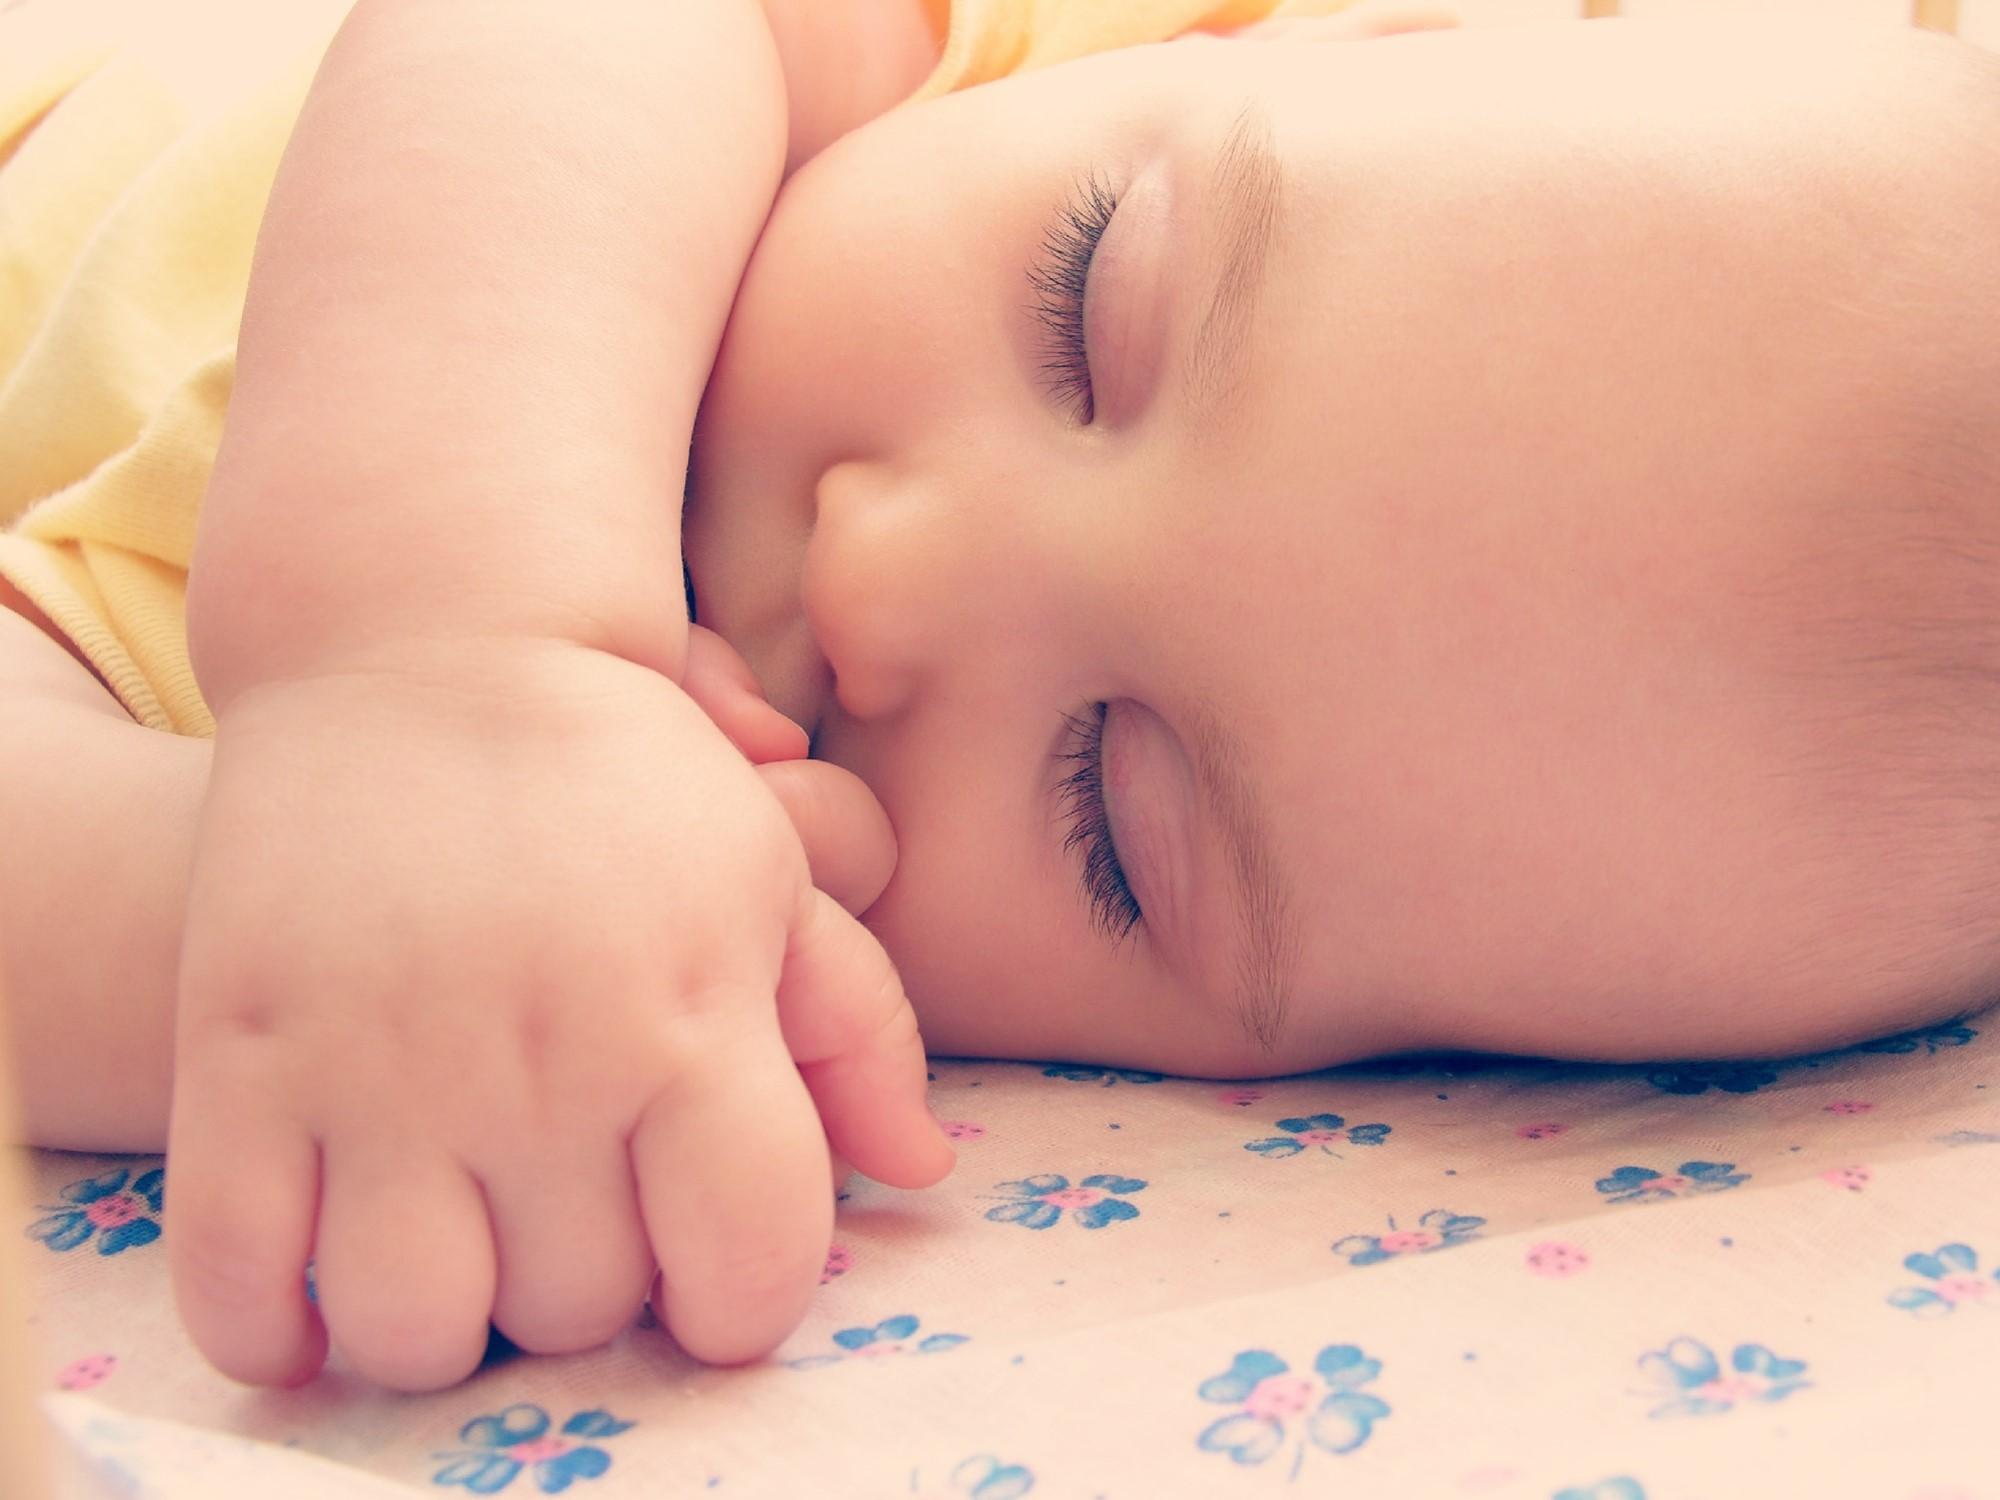 sintomas de la gota en niños